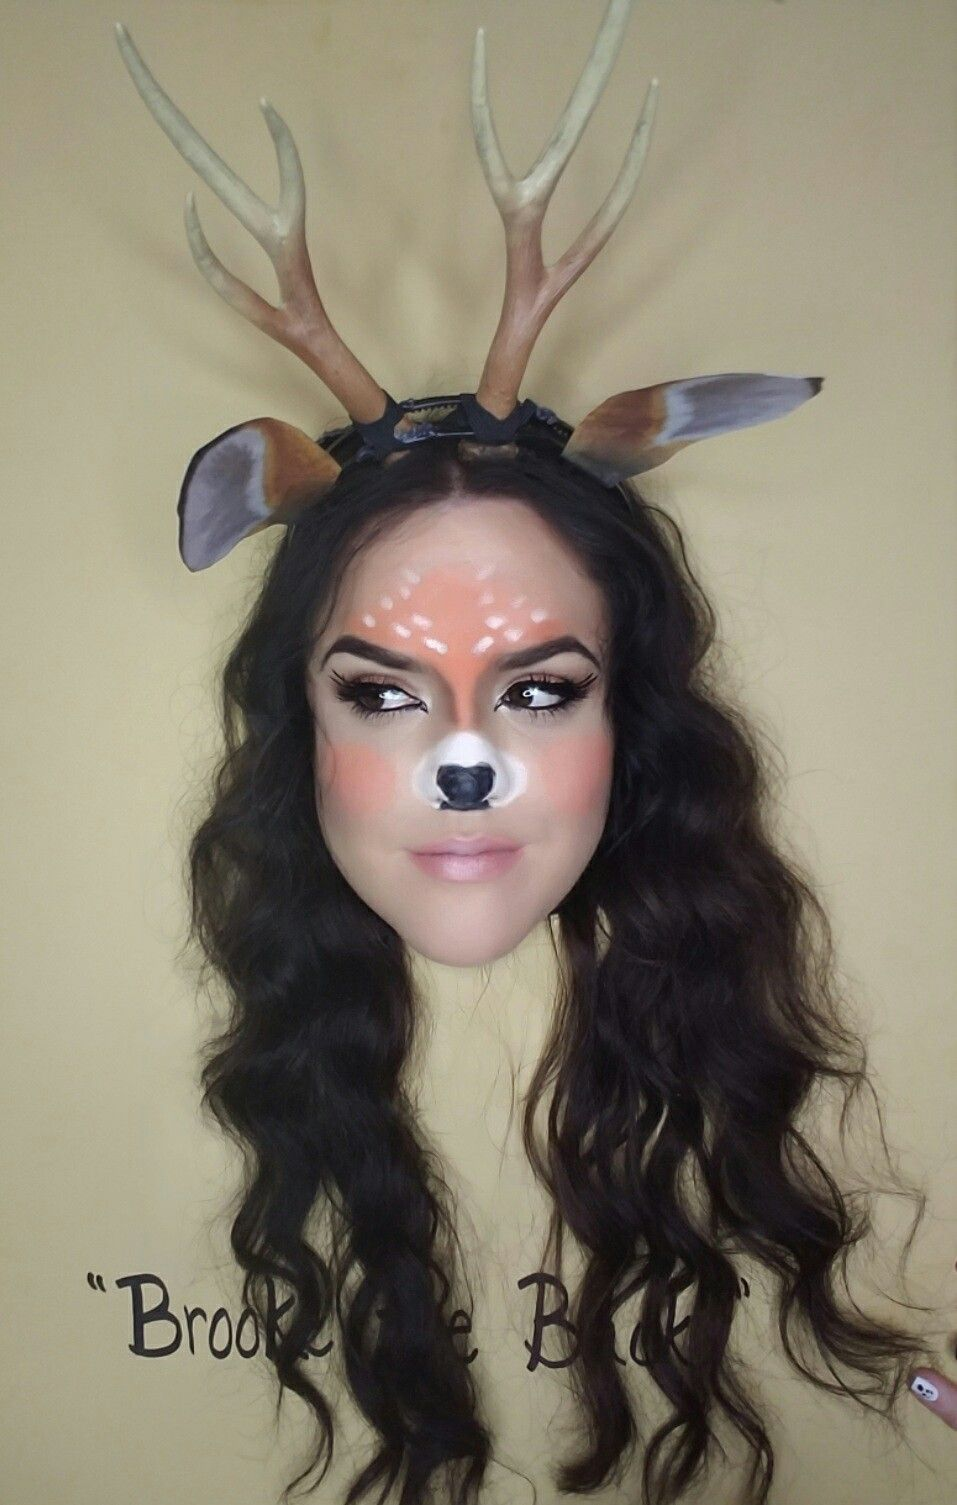 Deer, makeup, costume, snapchat, filter, Halloween, diy